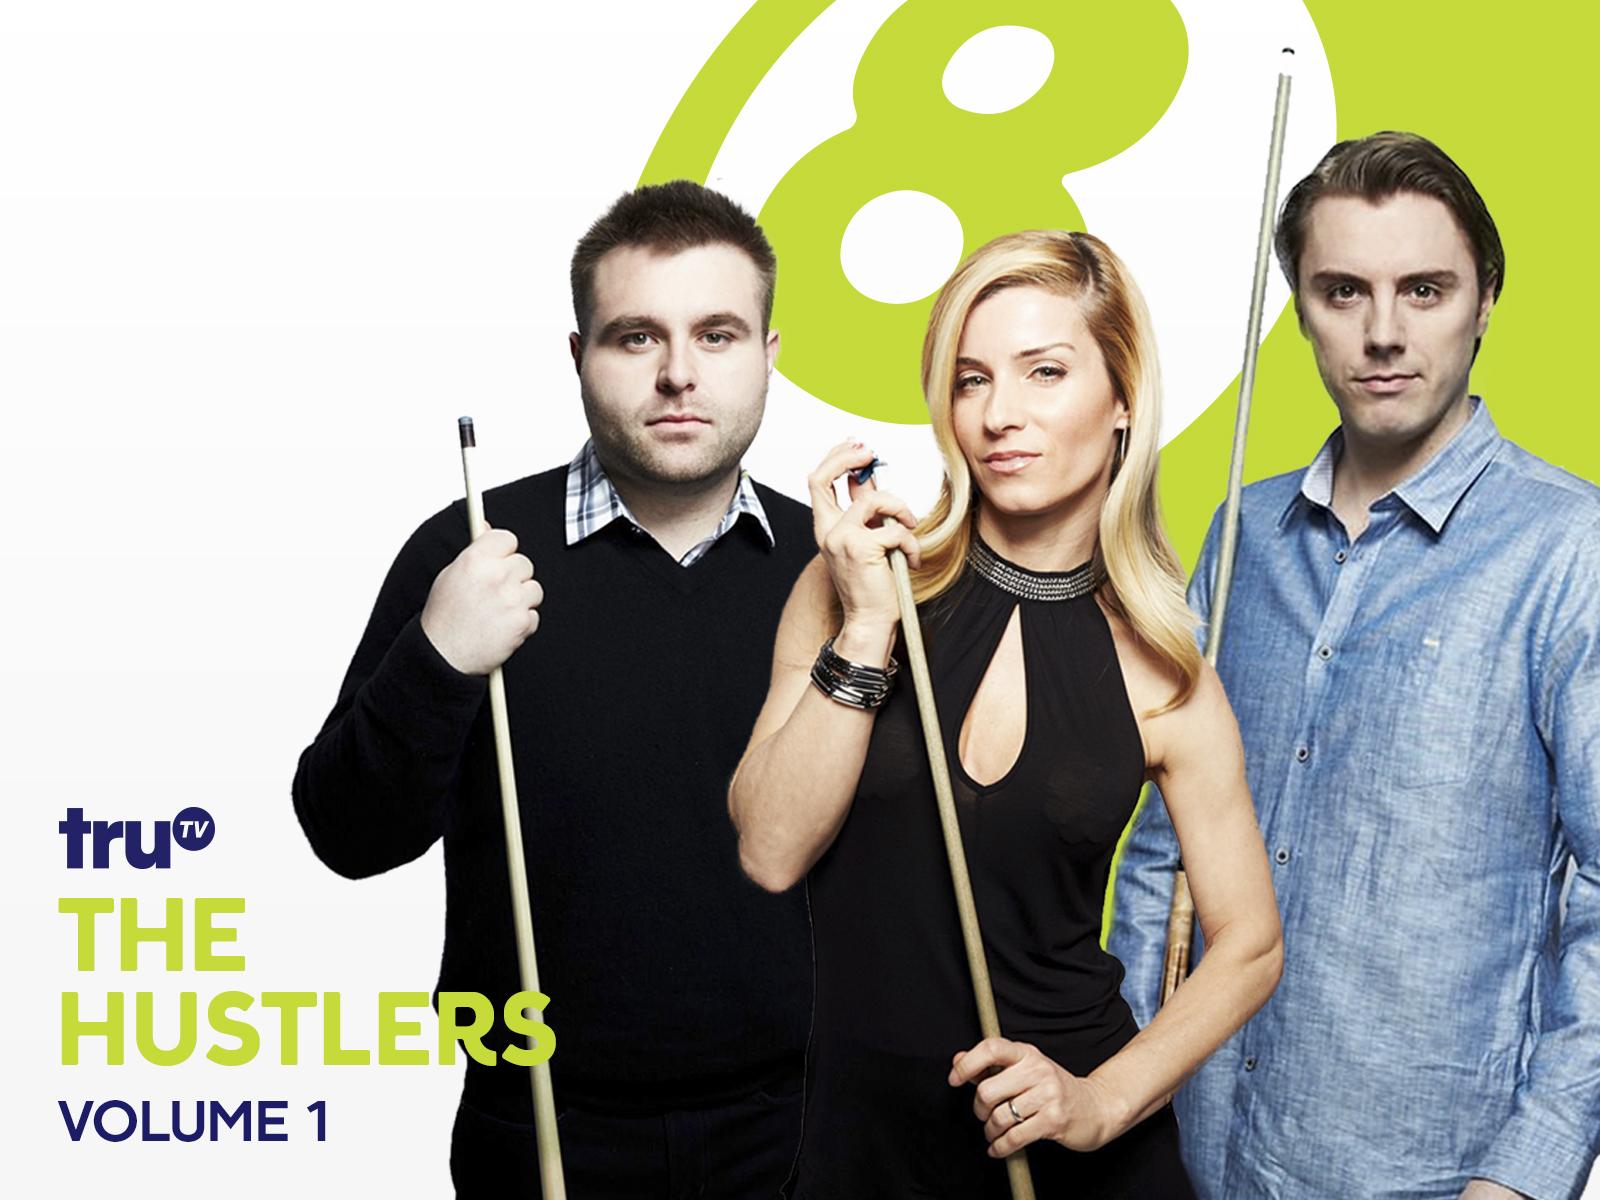 Watch The Hustlers Episodes Online | Season 1 (2015) | TV Guide